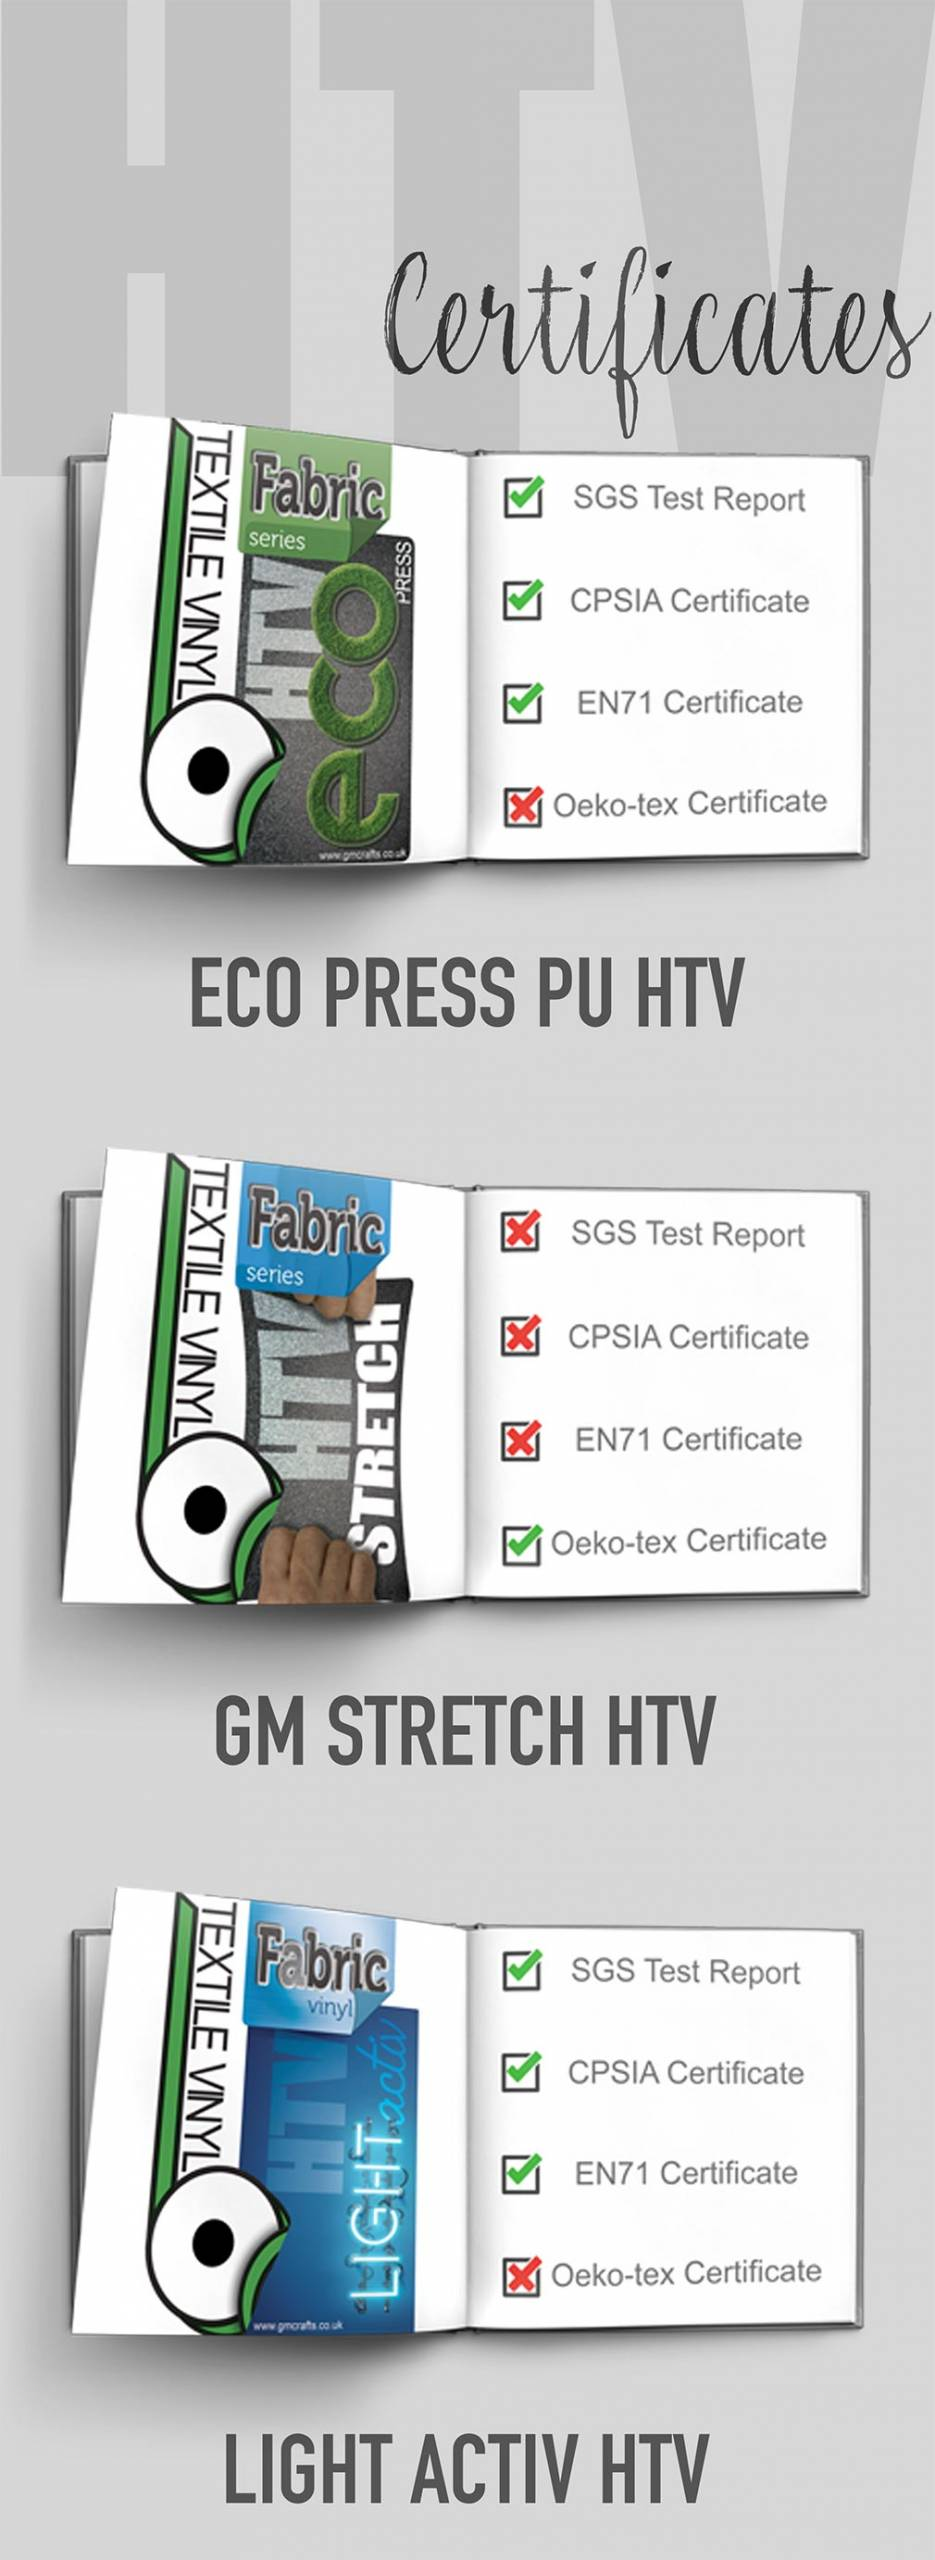 Mobile-HTV-Certificates-1